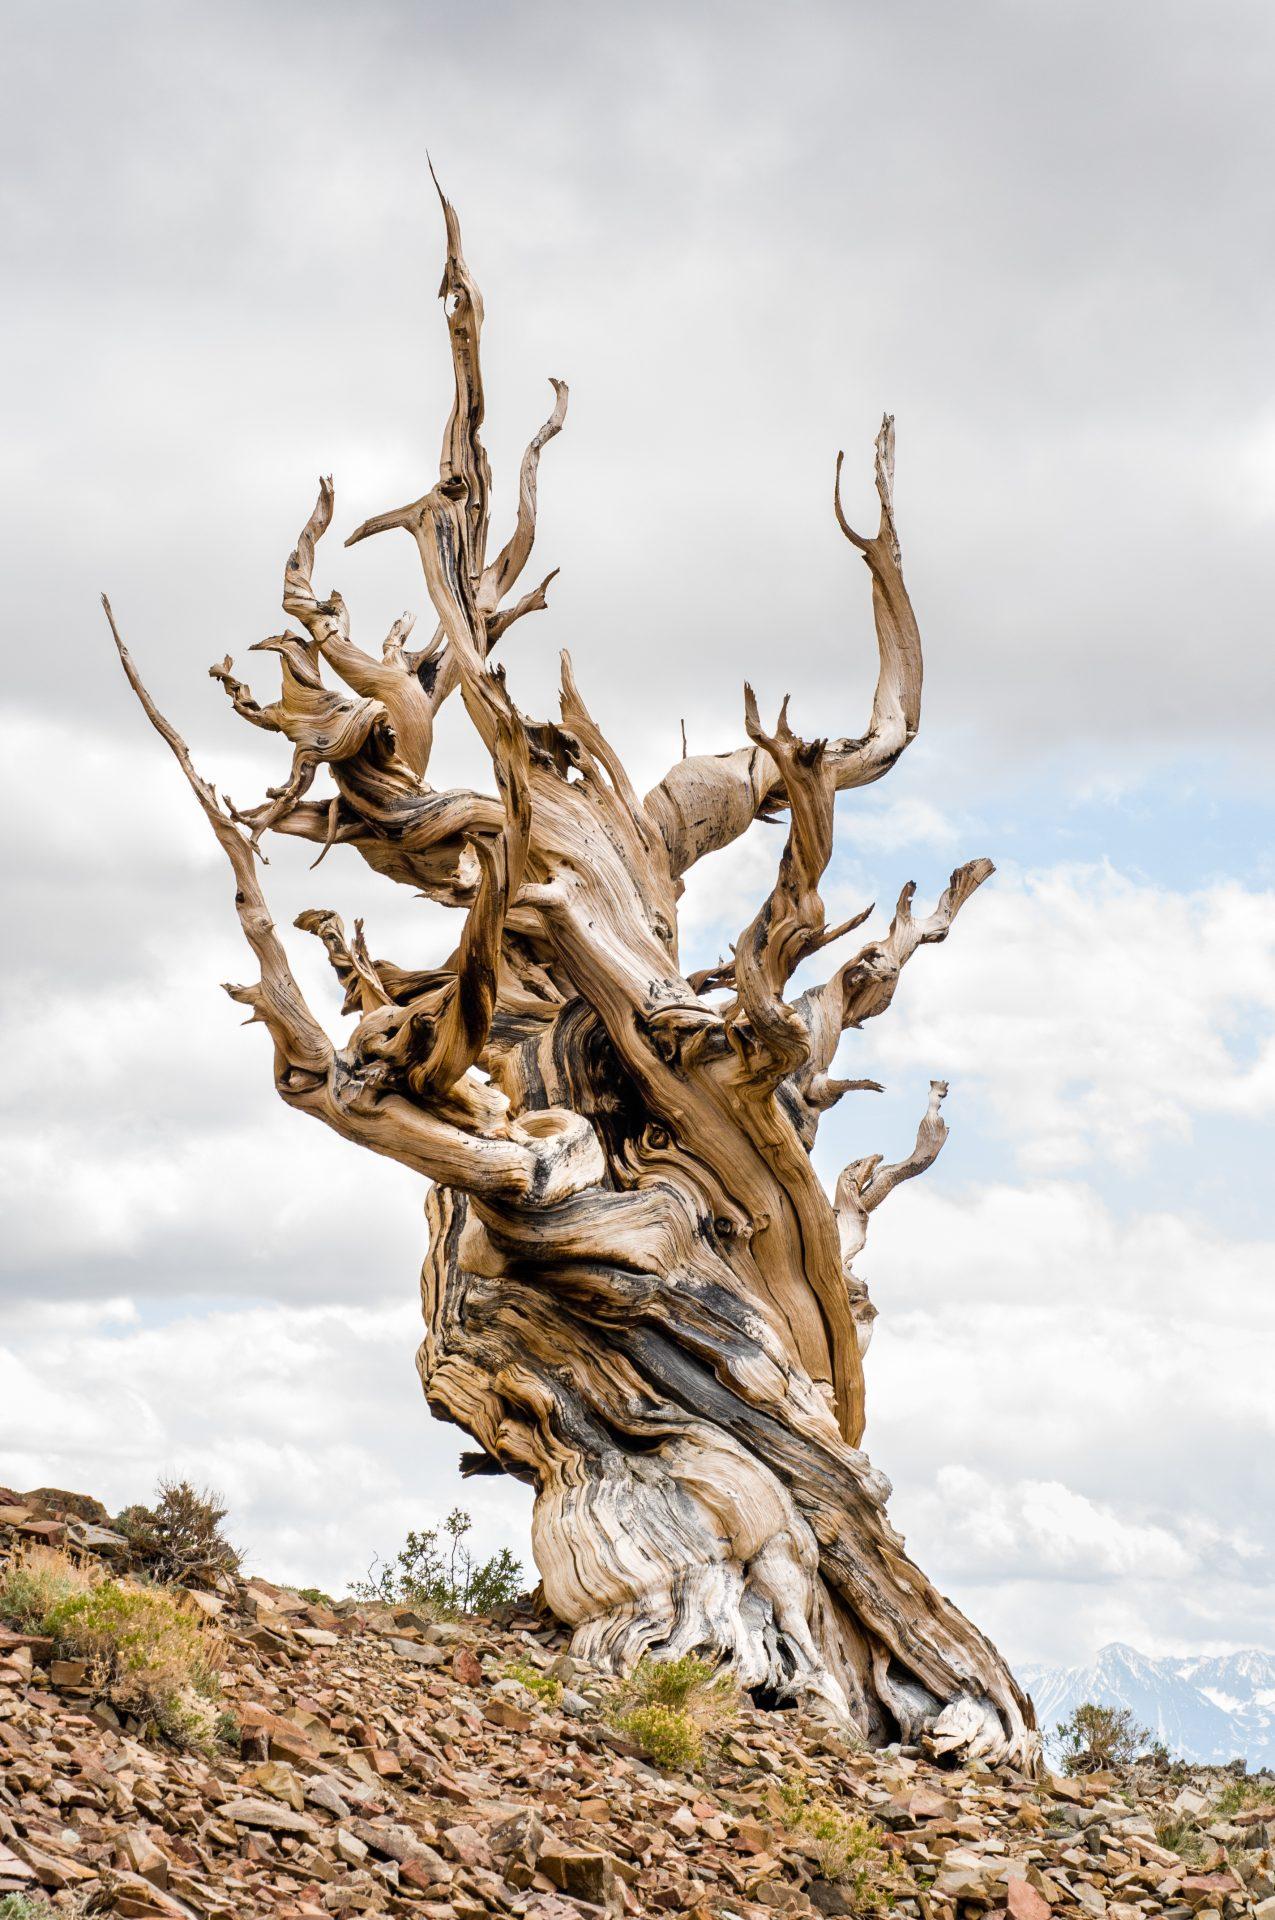 Bristlecone Pine scaled